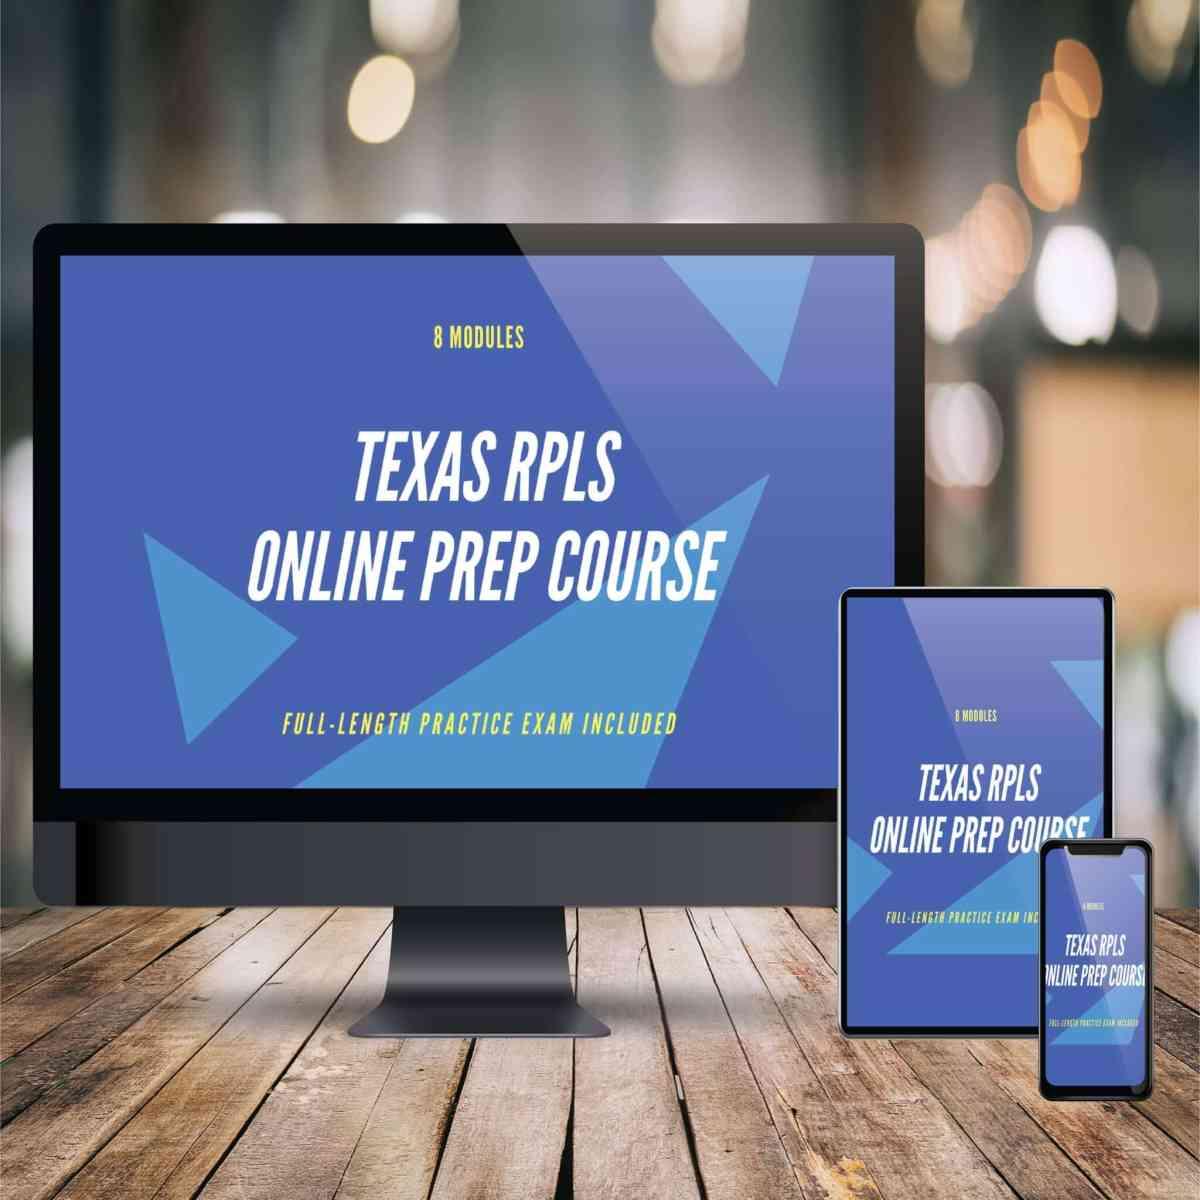 TX RPLS Online Prep Course